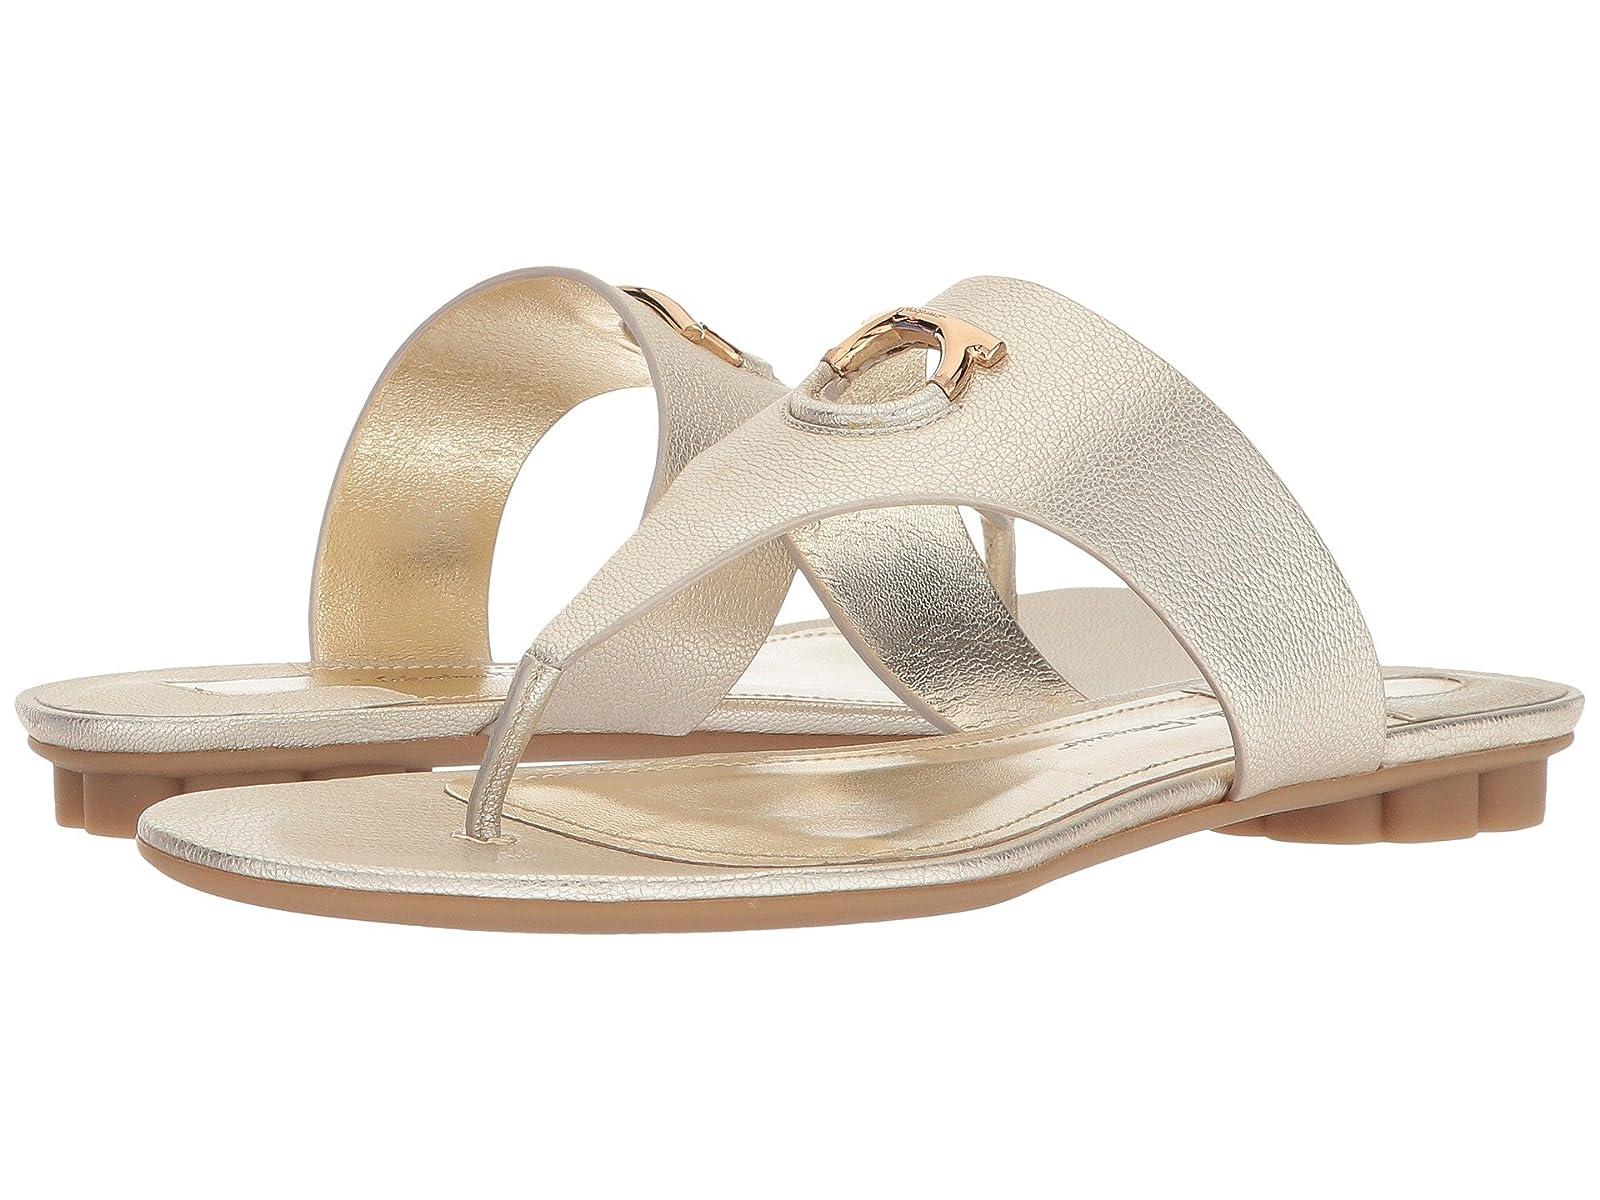 Salvatore Ferragamo EnfolaCheap and distinctive eye-catching shoes